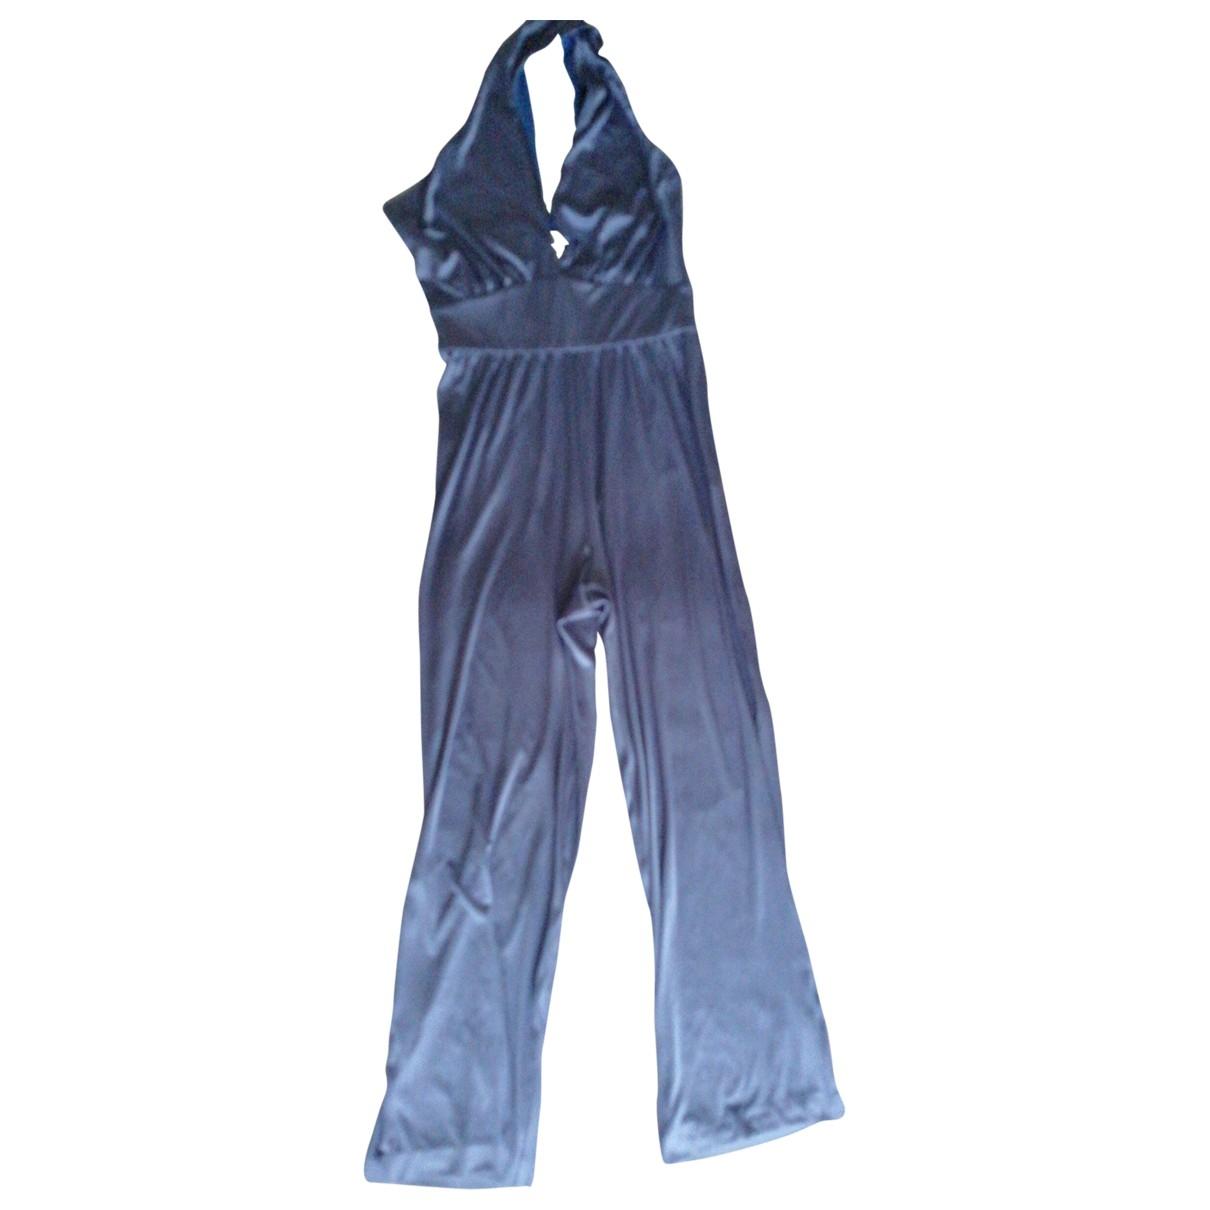 Halston Heritage \N Navy jumpsuit for Women 4 US